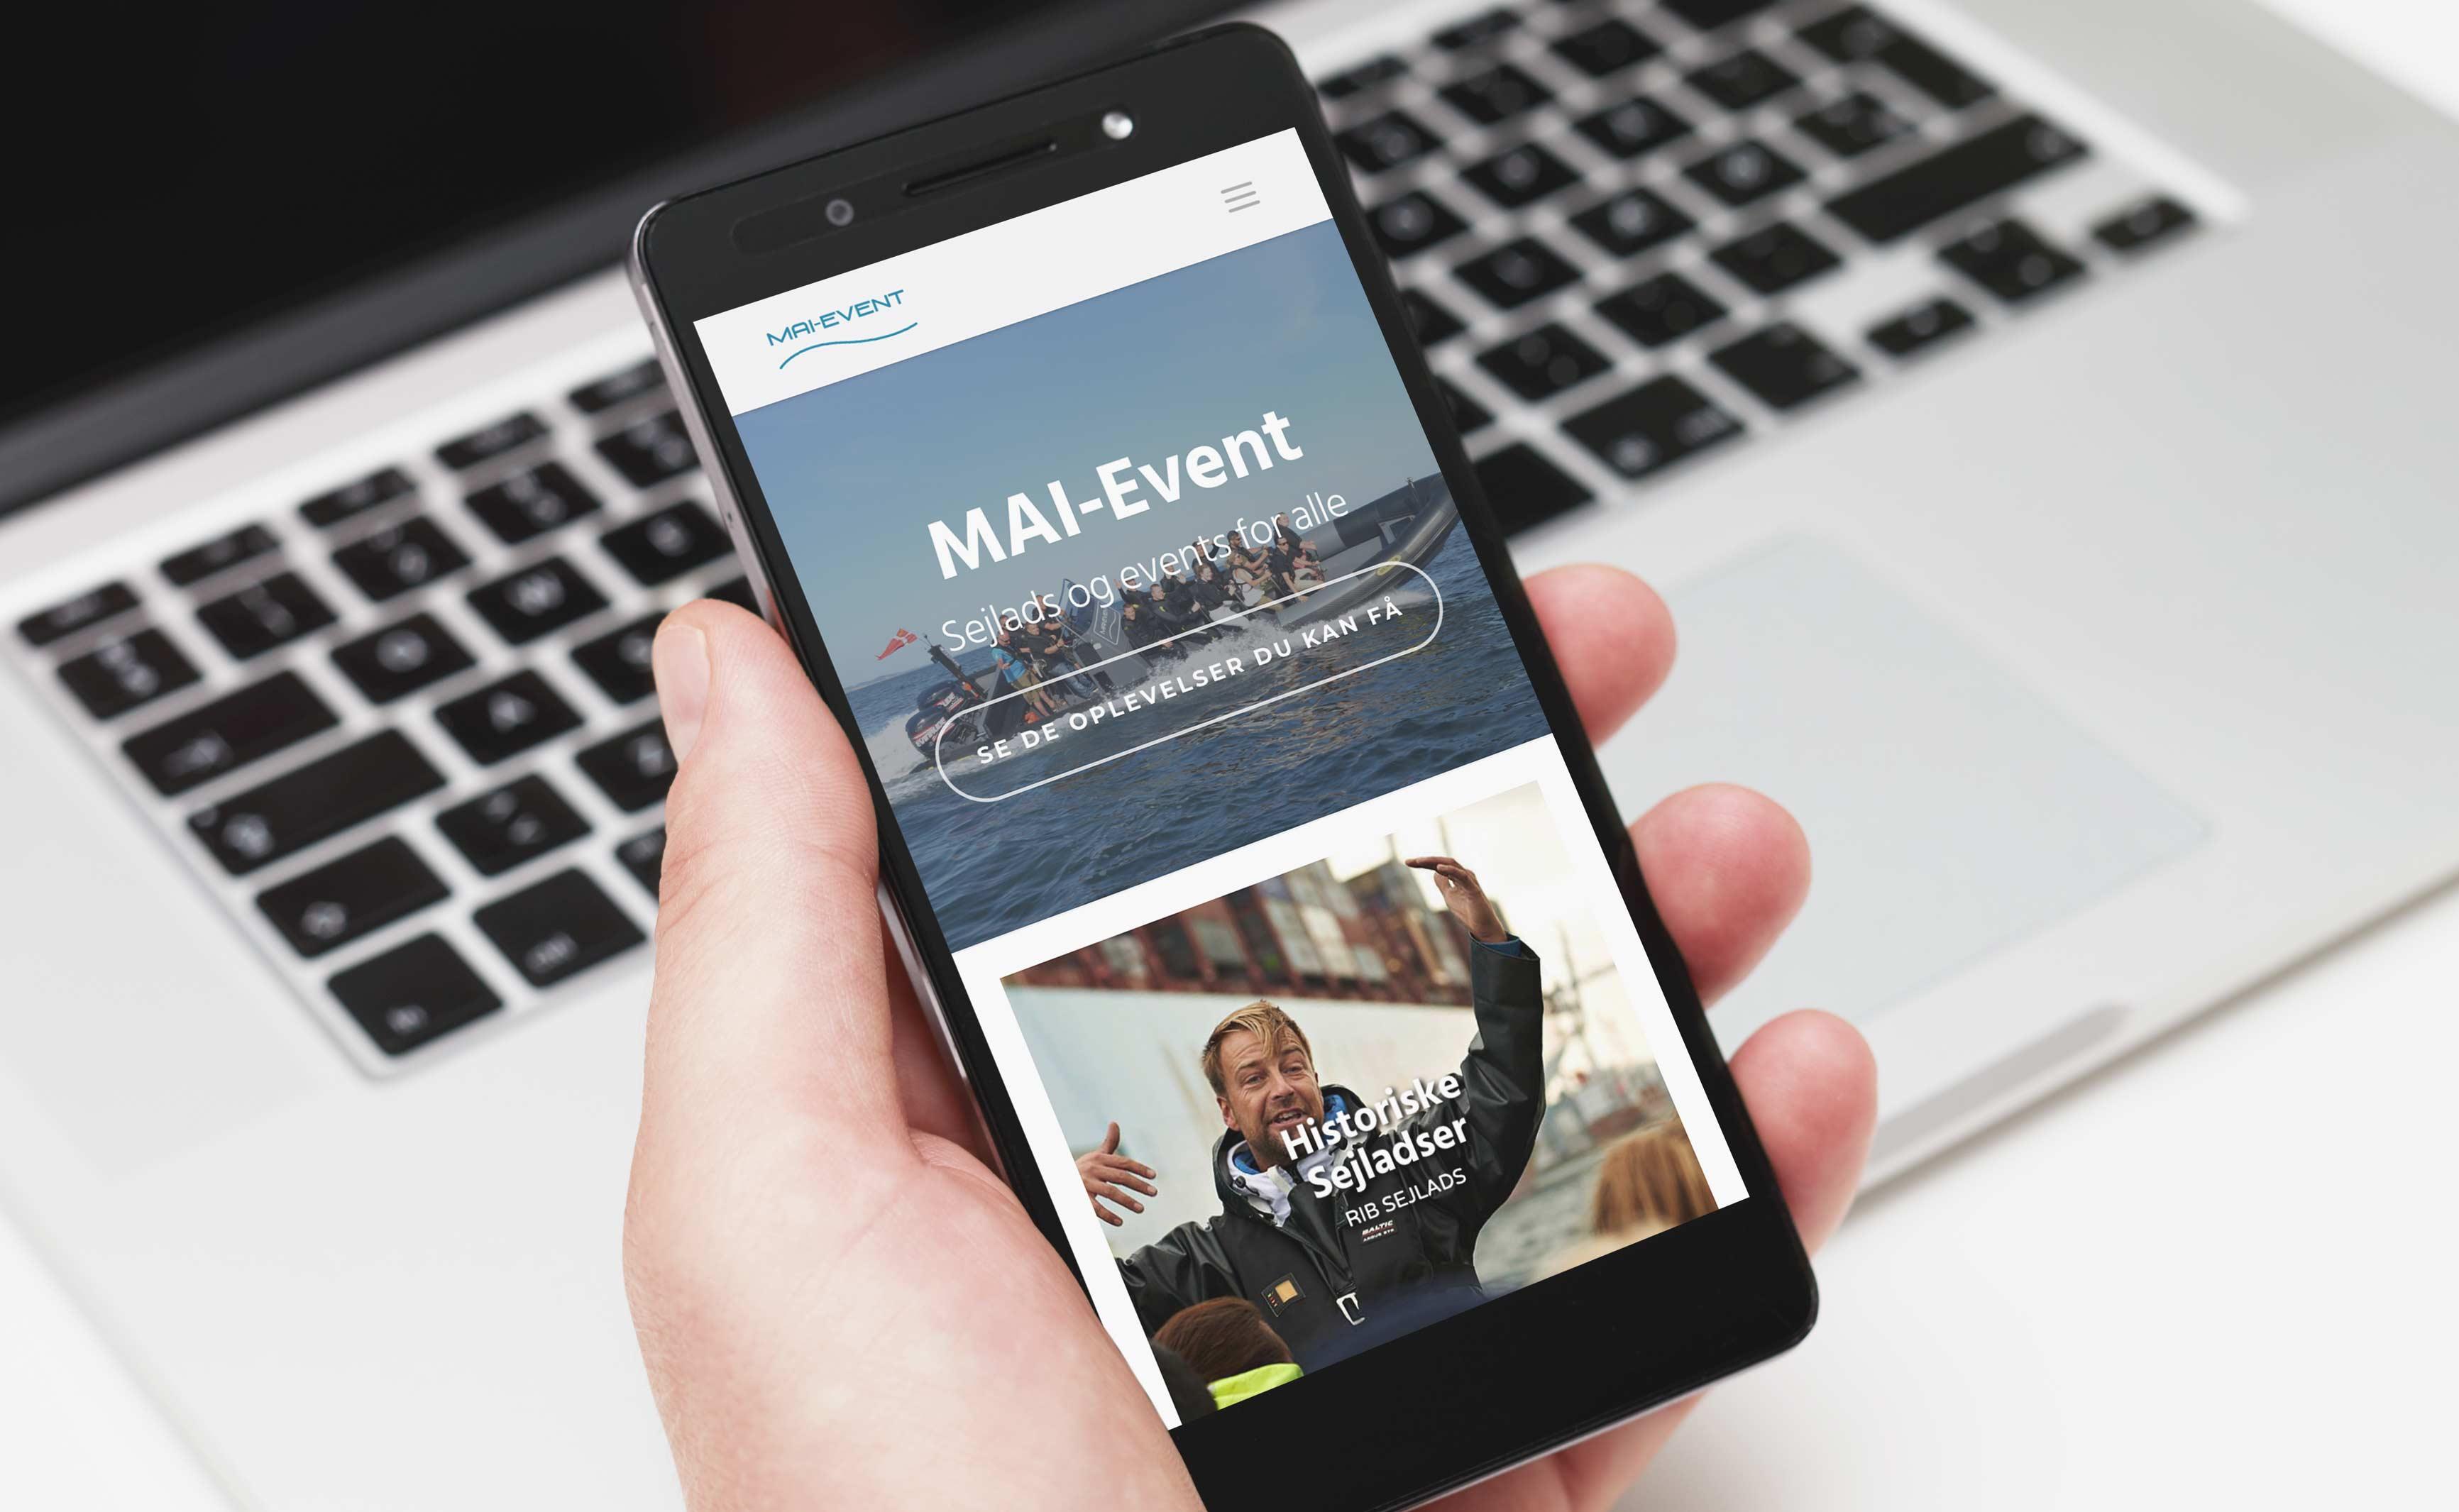 Case: Mai-Event fixed billede mobiltelefon